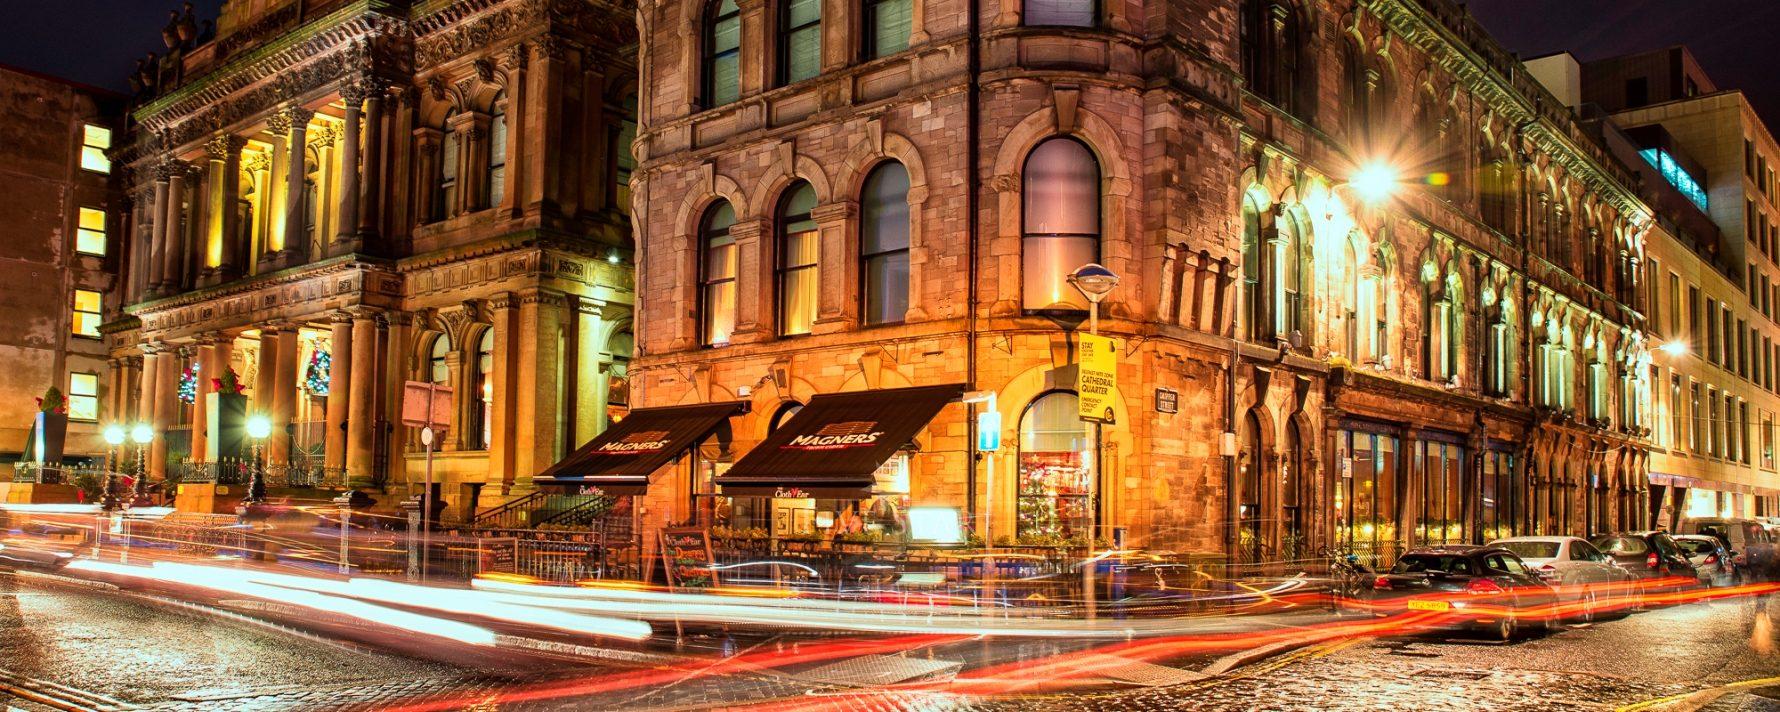 Merchant Hotel photo 1